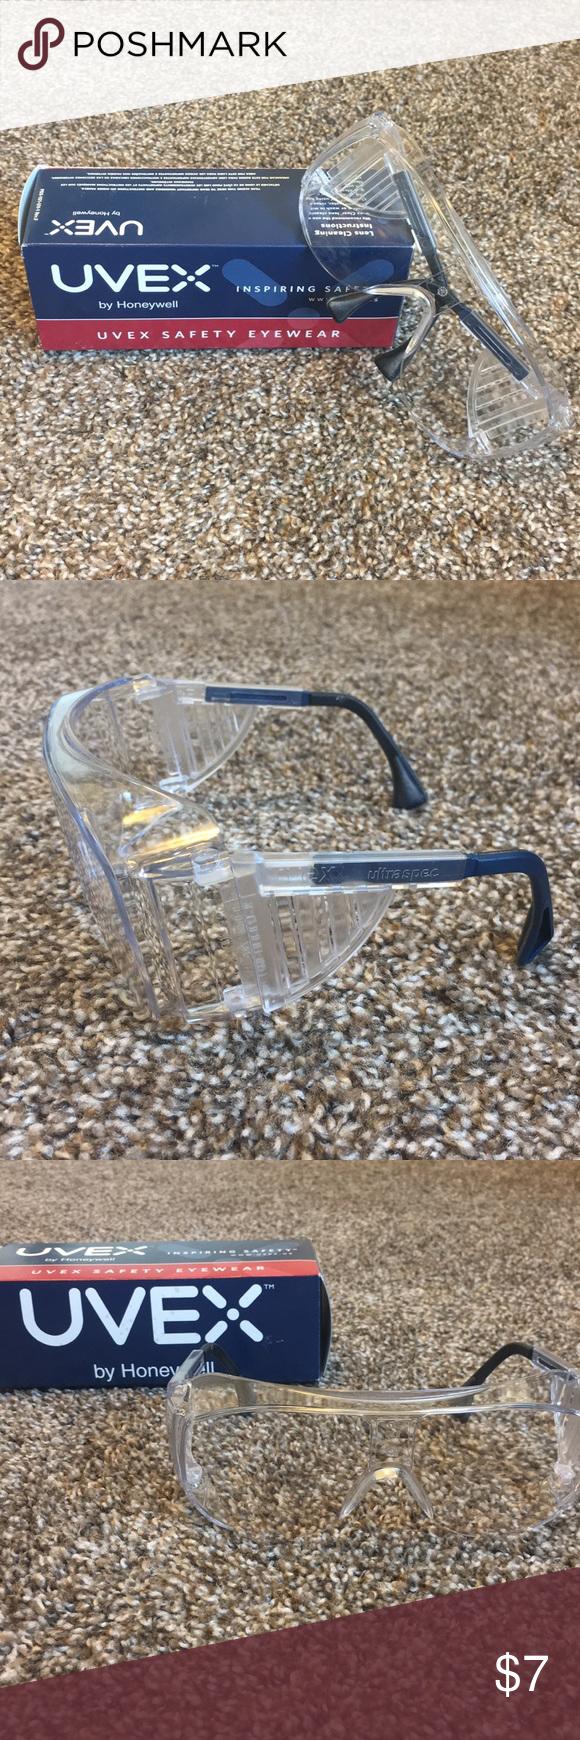 Uvex Lab Safety Glasses * Size OS * Brand Uvex by